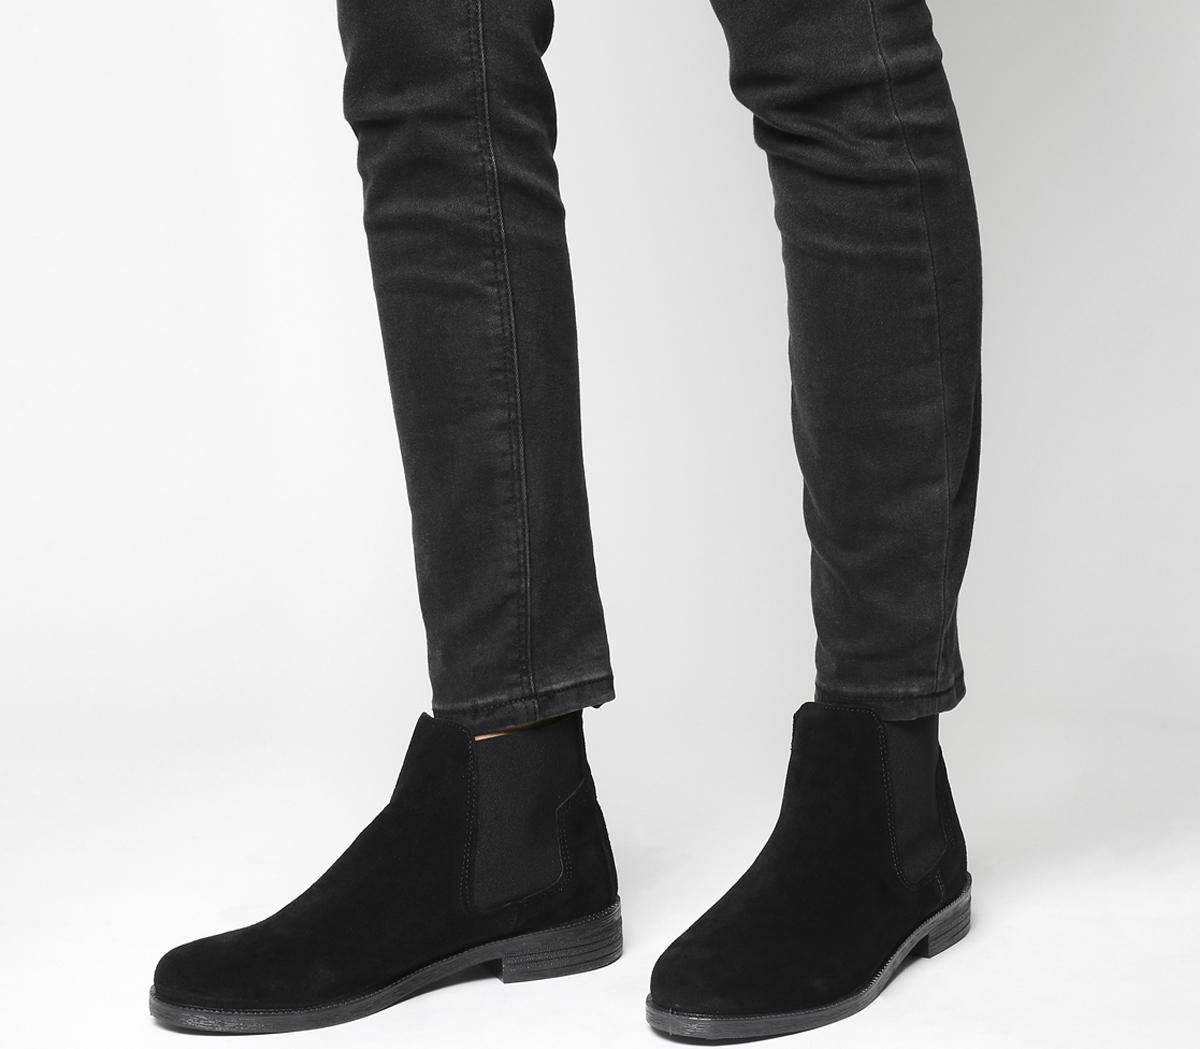 Office Jamie Chelsea Boots Black Suede